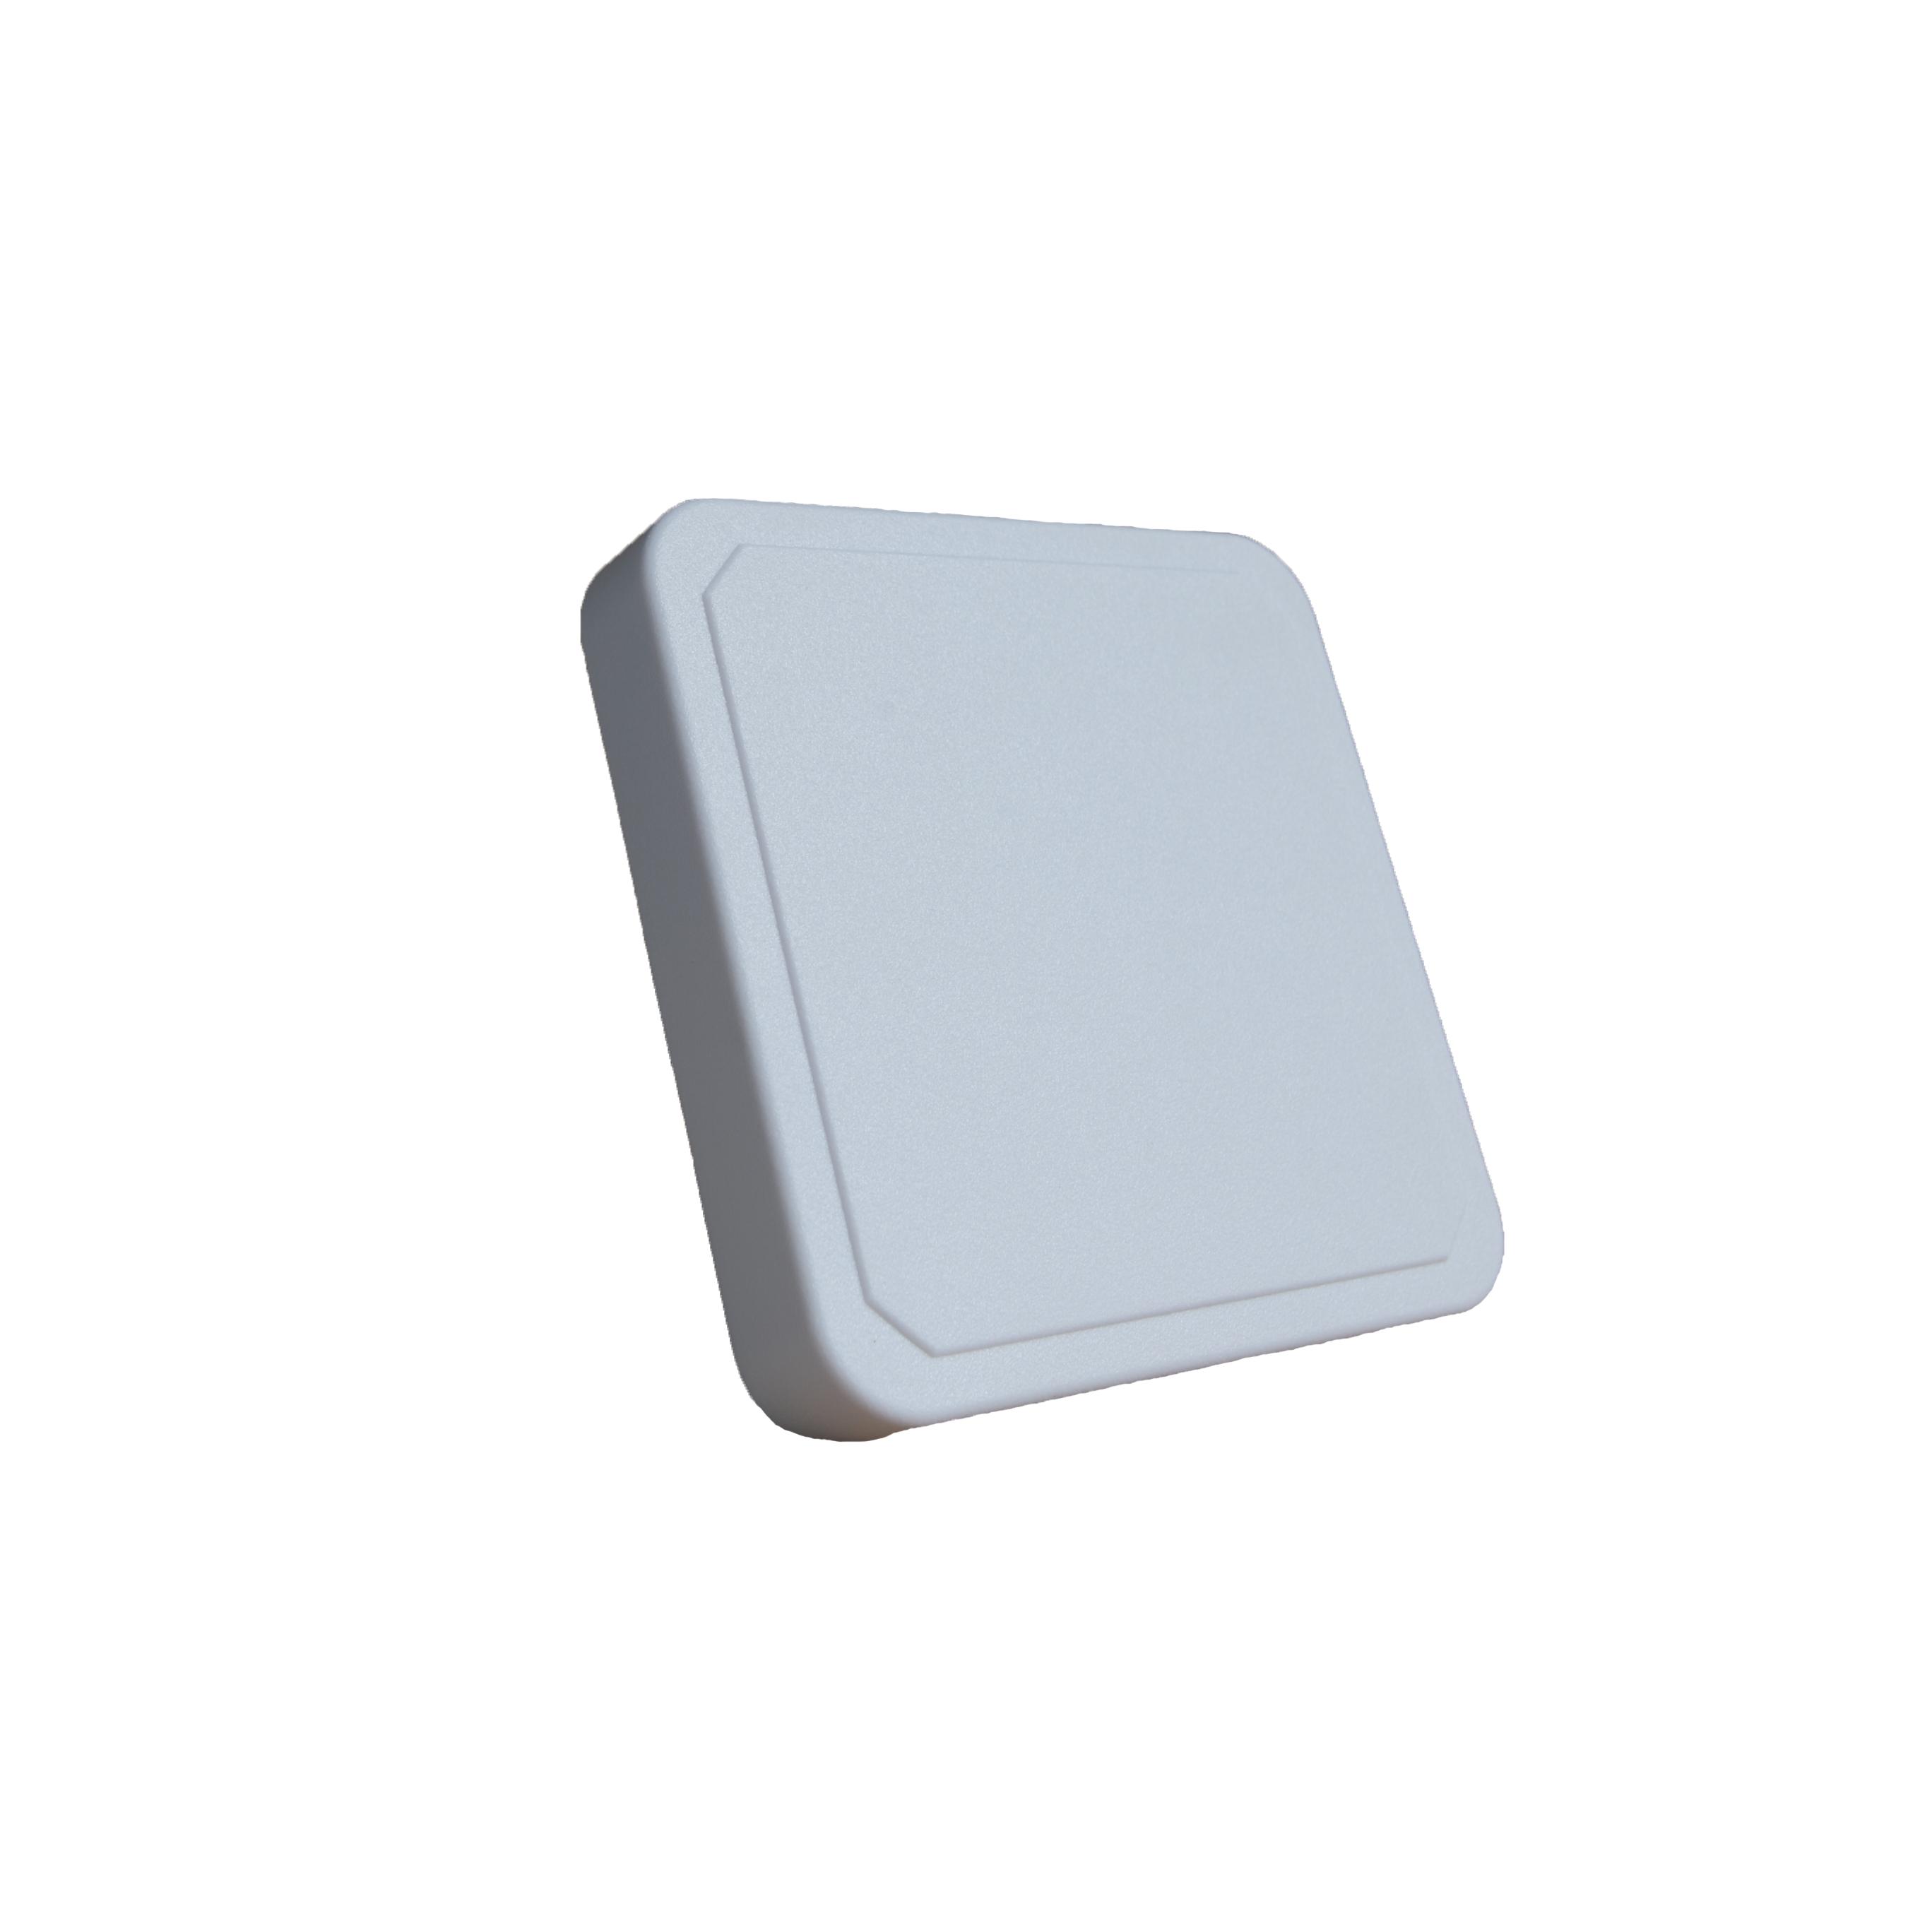 5x5in 5dBic Circular UHF RFID ANTENNA